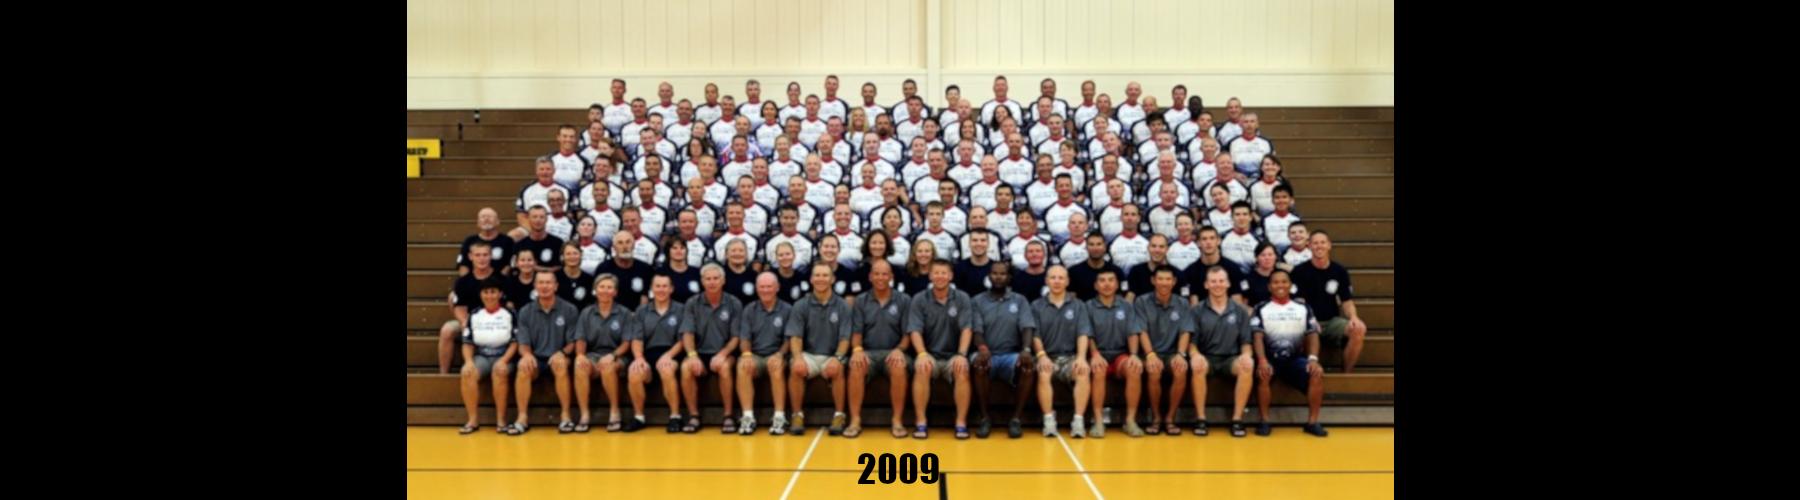 2009Banner